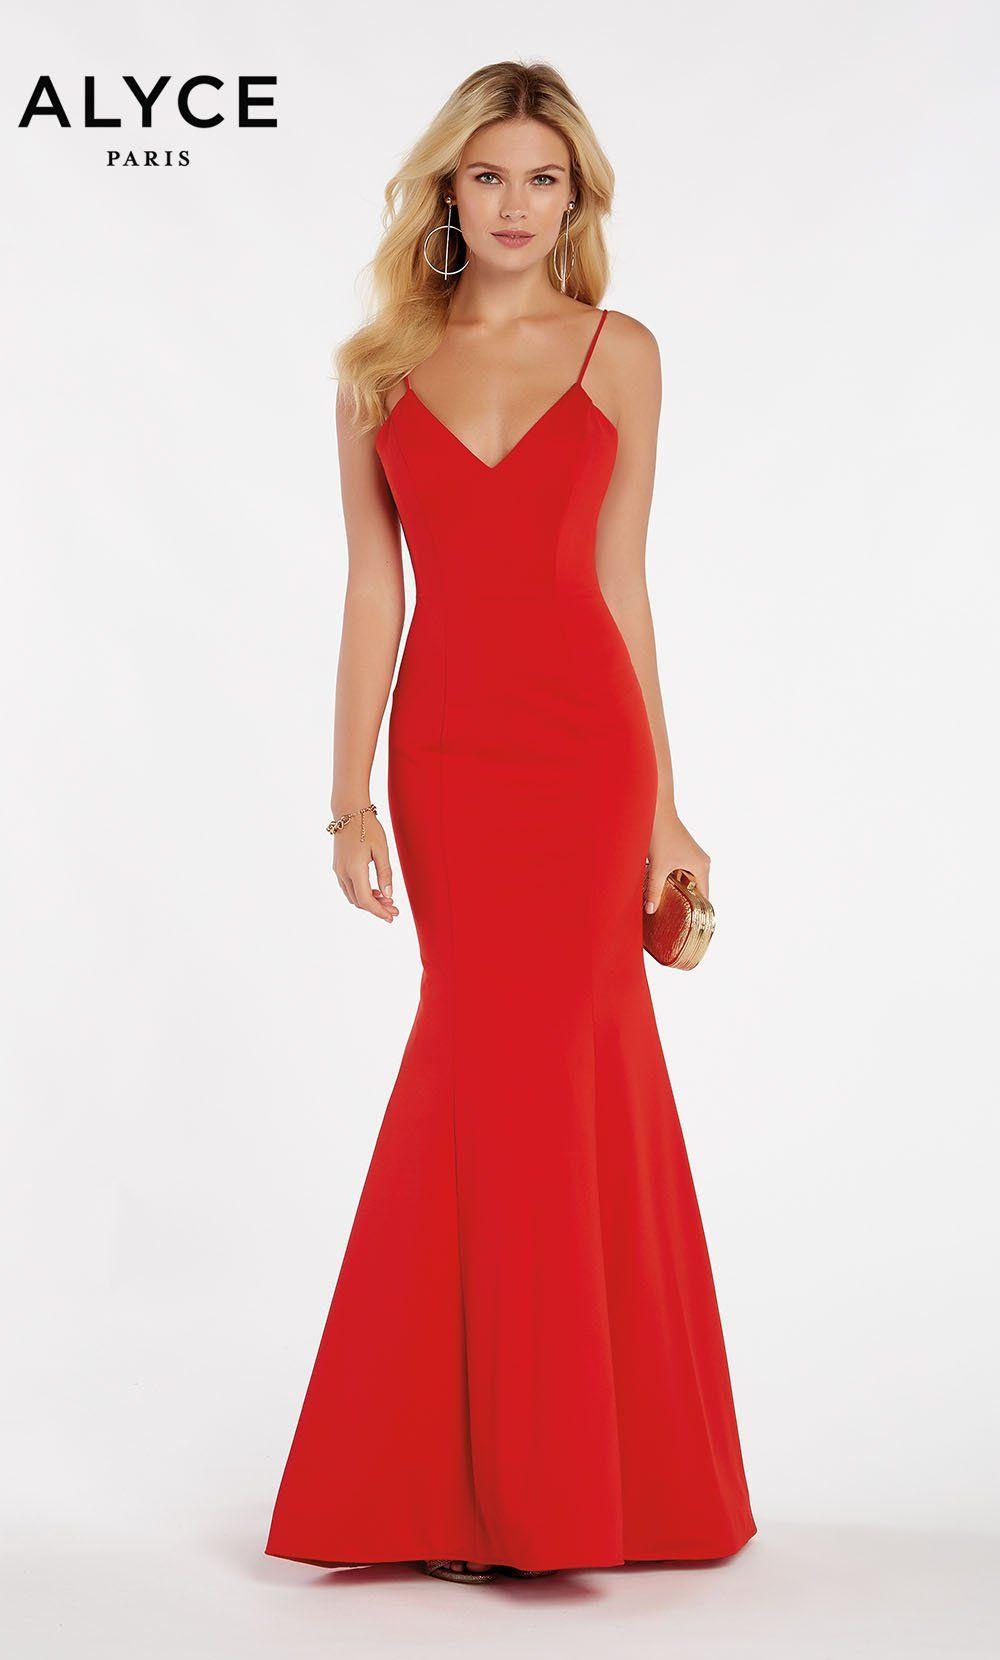 16916d71b8 Alyce prom dress style 60293